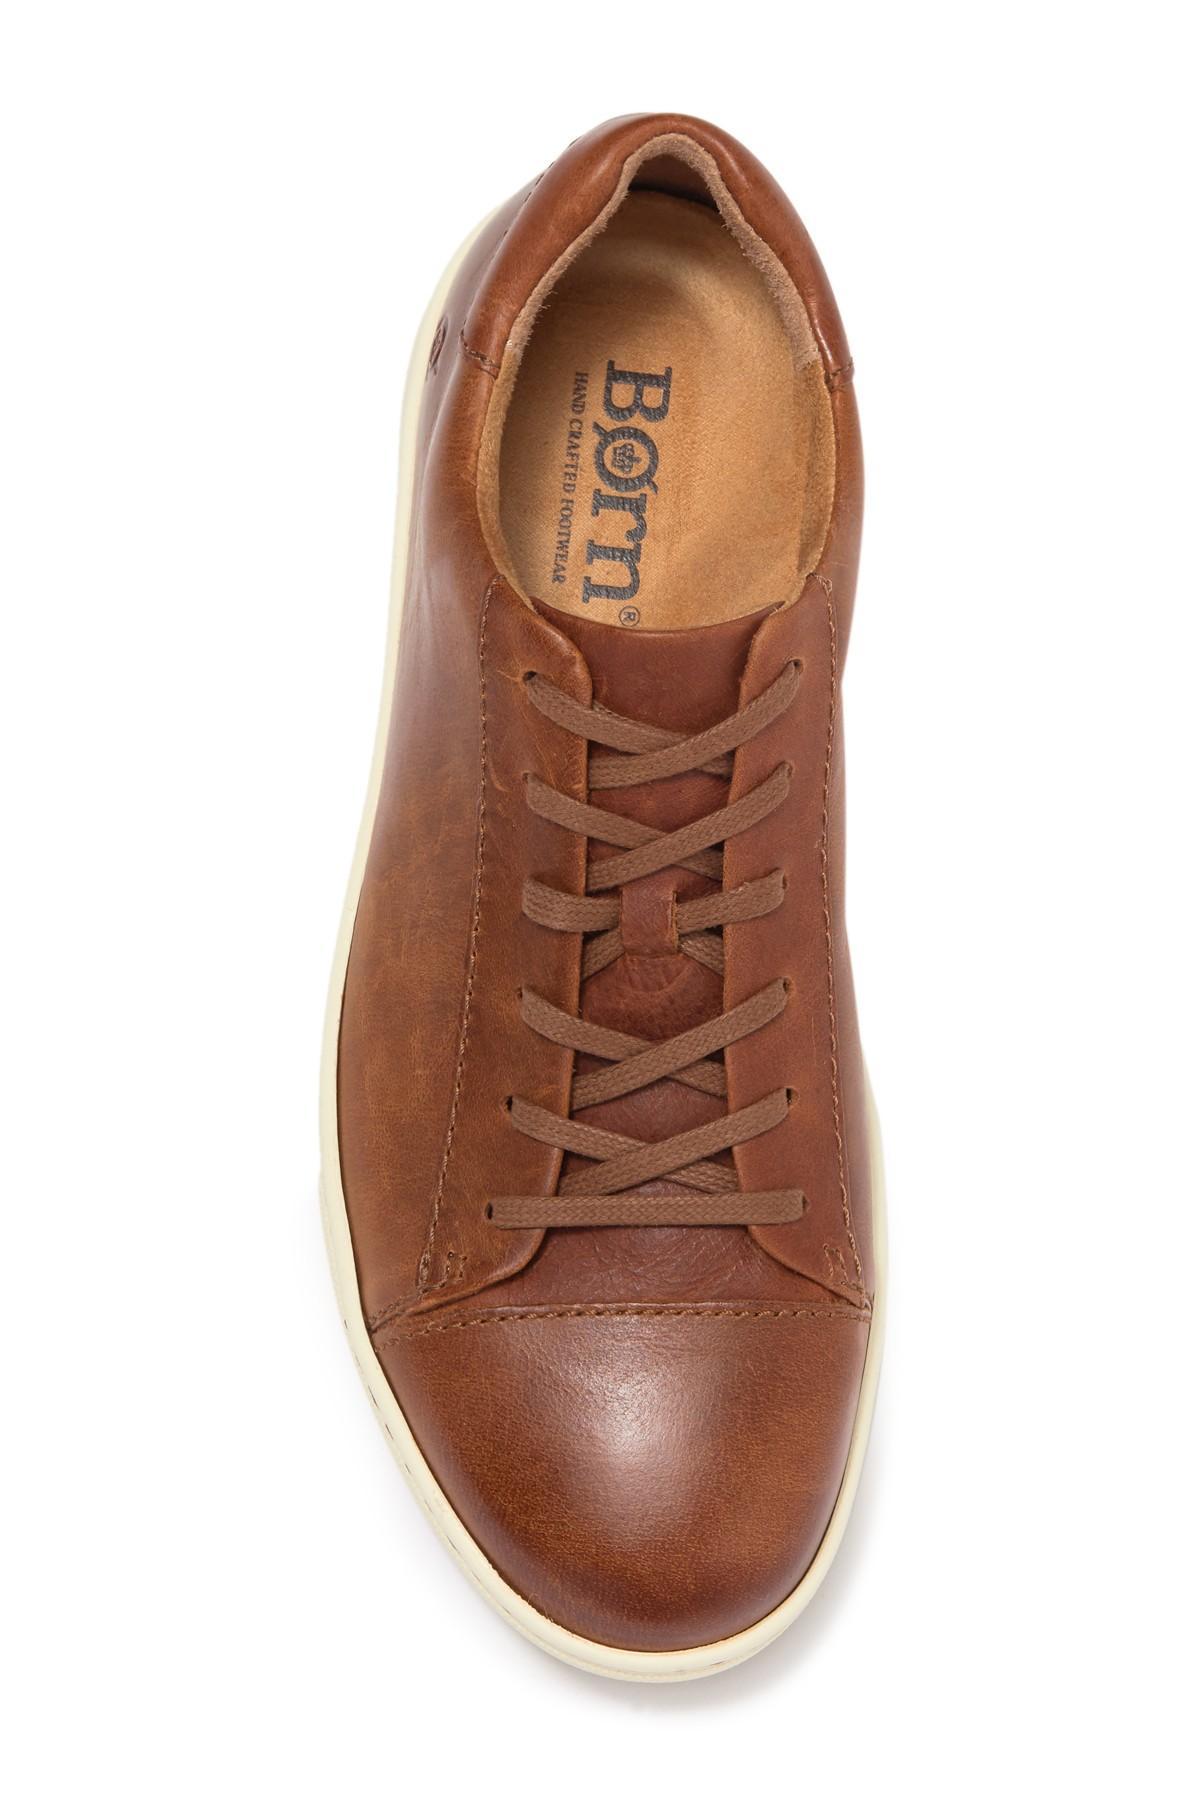 Born Ashram Leather Sneaker in Tan